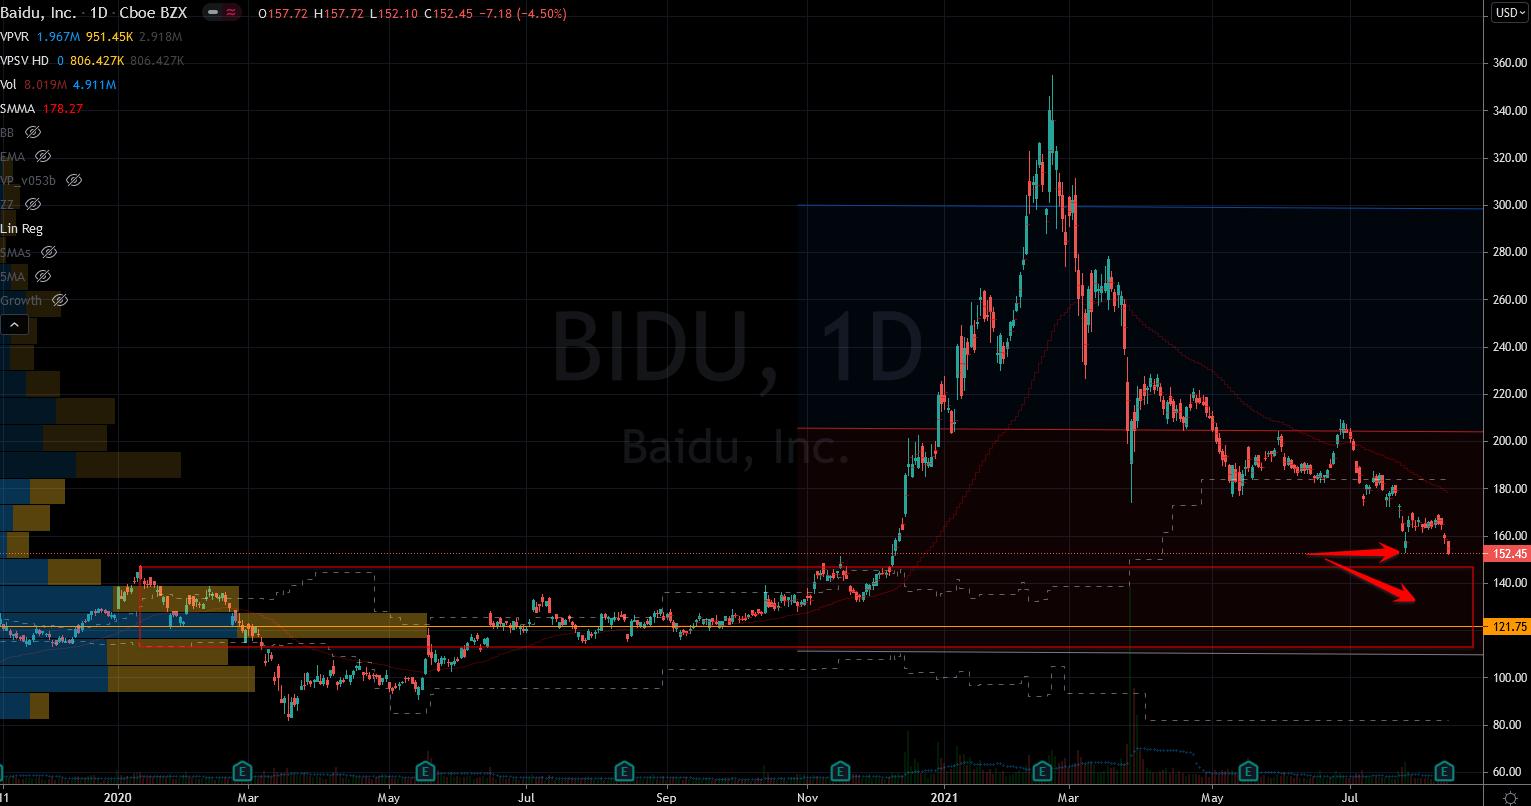 Stocks to Buy: Baidu (BIDU) Stock Chart Showing Potential Support Zones